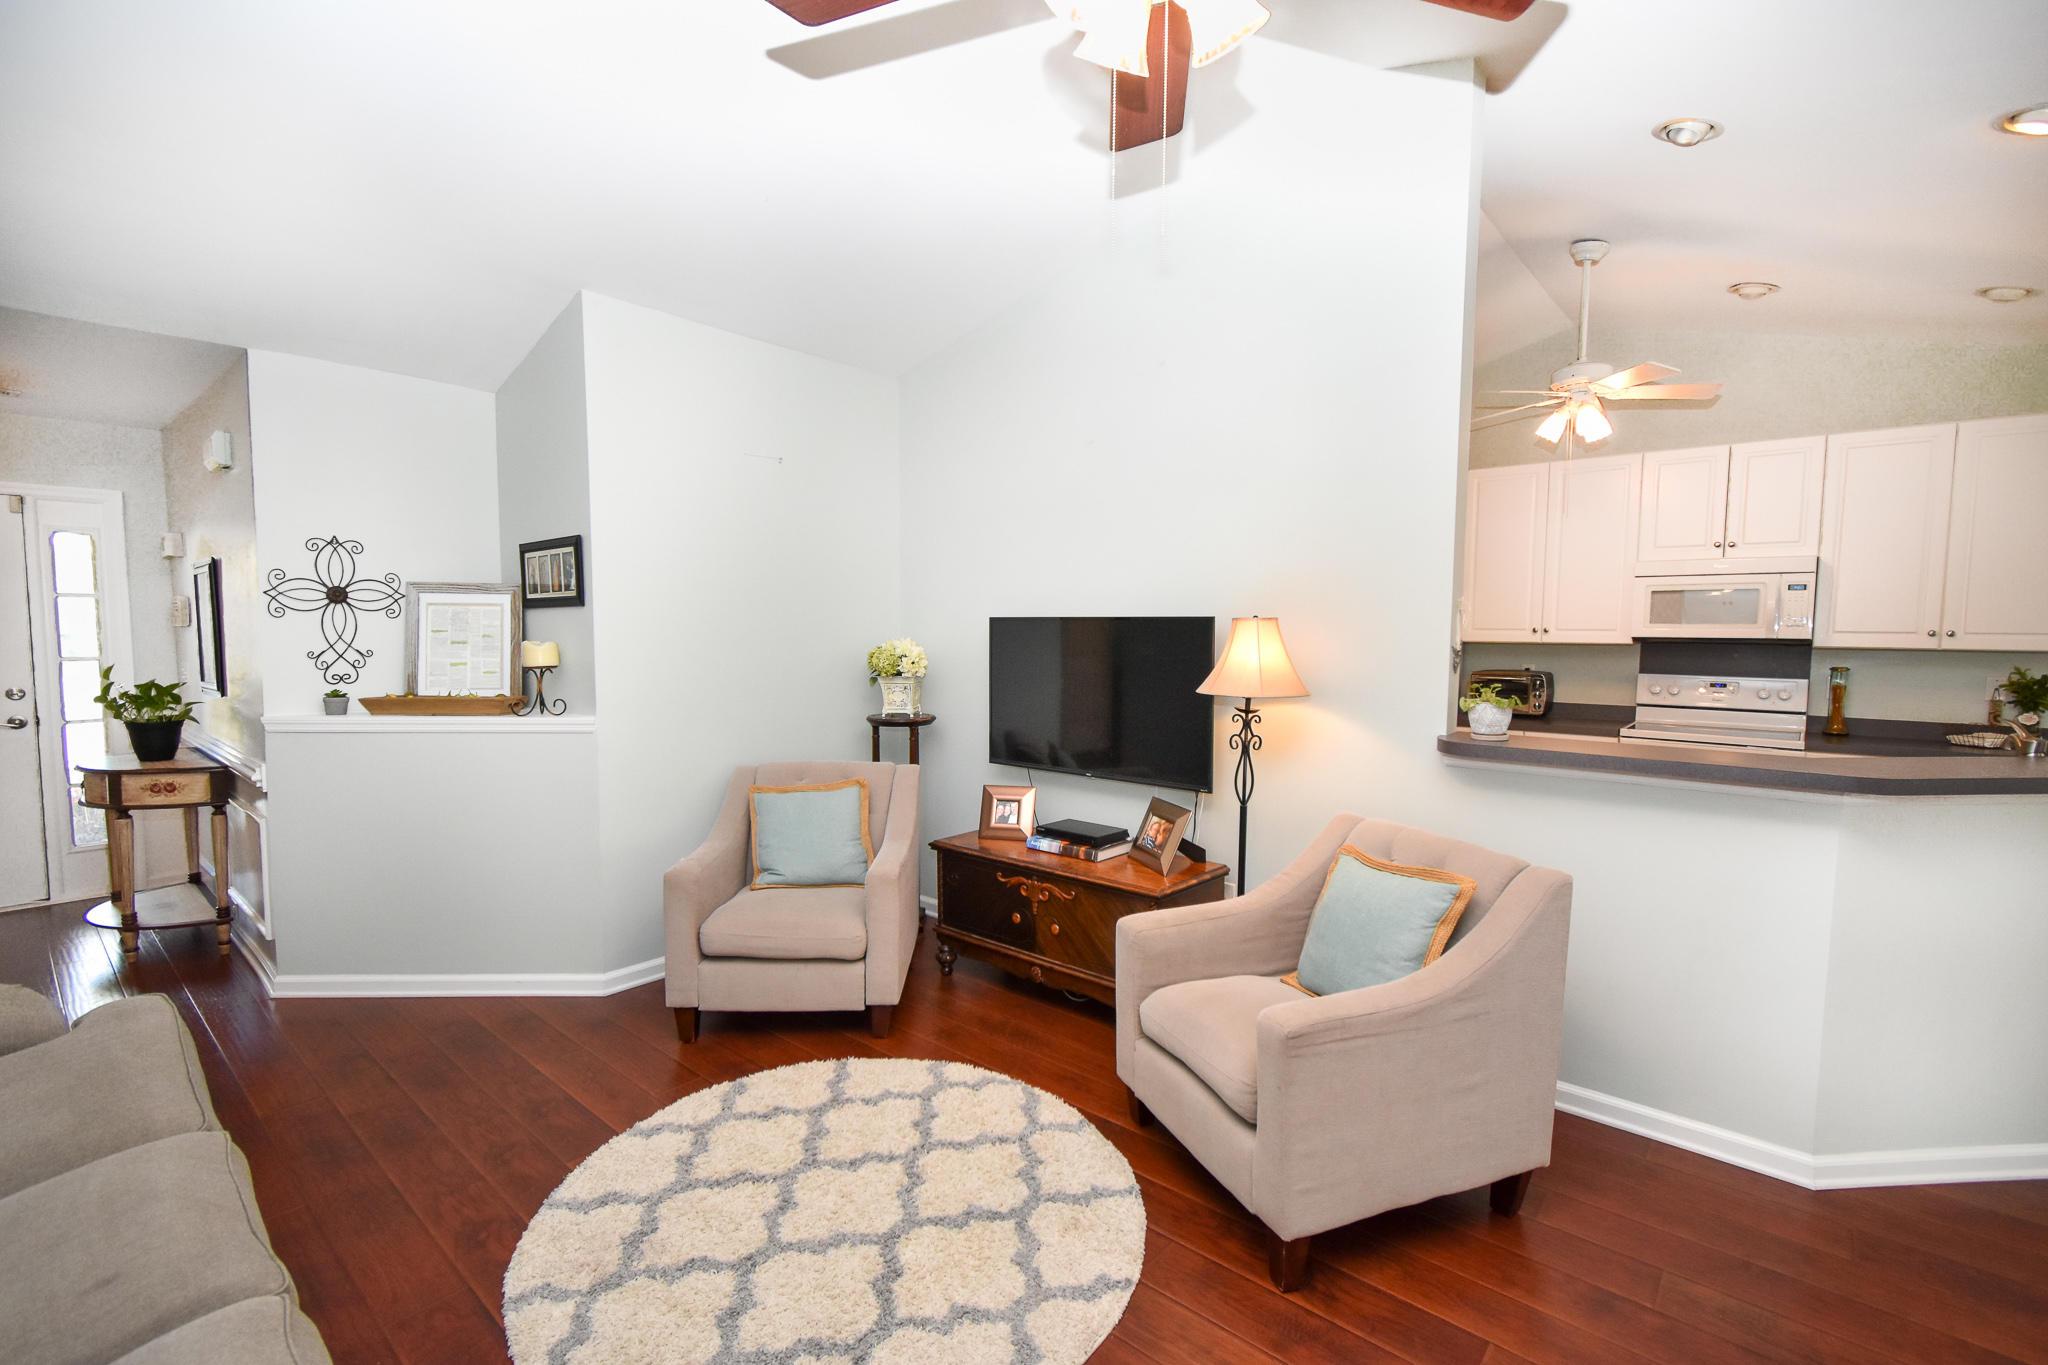 Park West Homes For Sale - 1444 Wellesley, Mount Pleasant, SC - 4